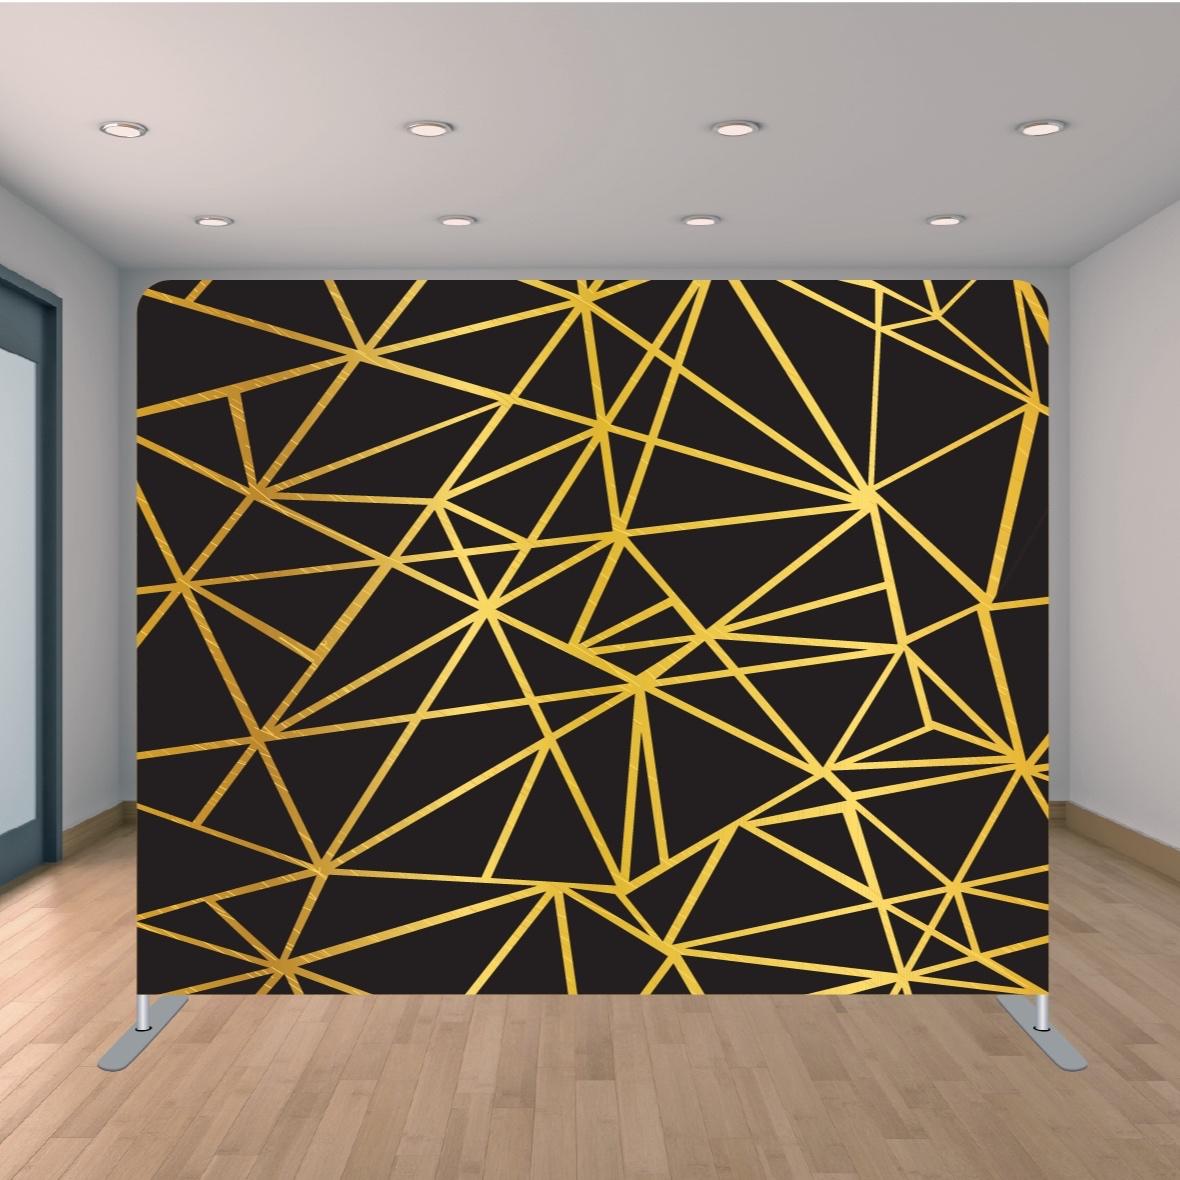 Black_and_Gold_Geometric-01.jpg